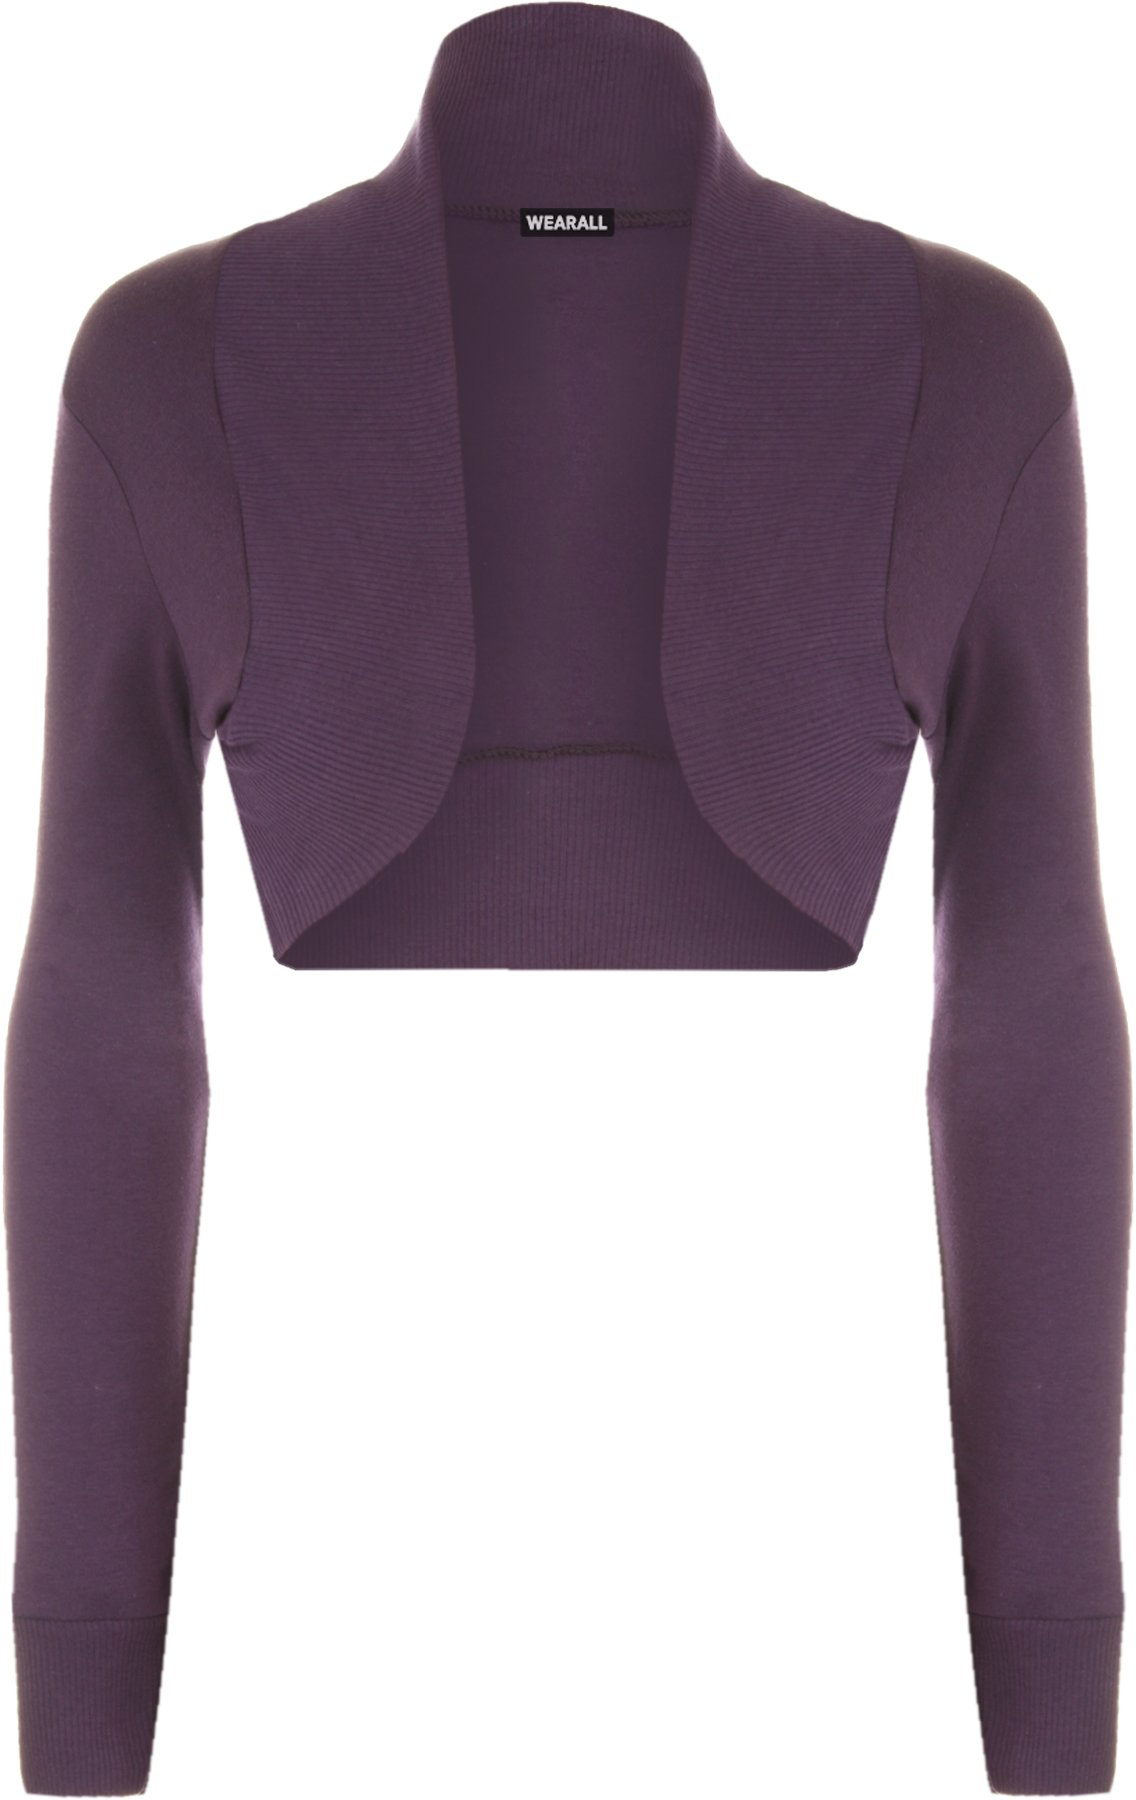 WearAll Women's Long Sleeve Shrug Ladies Bolero Top - Purple - US 16-18 (UK 20-22)